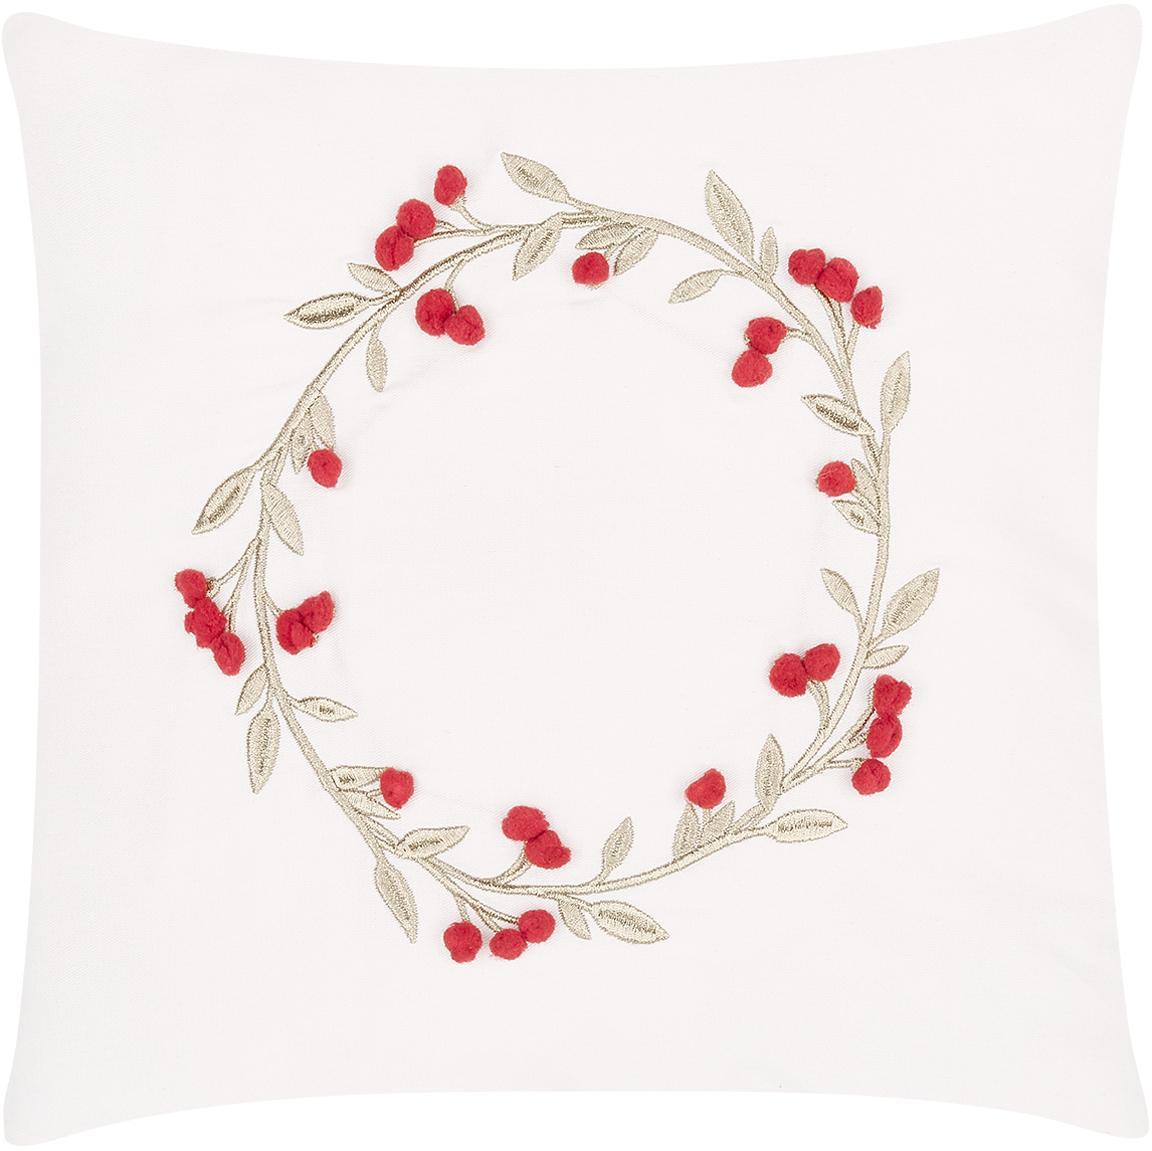 Bestickte Samt-Kissenhülle Christmas Wreath, Cremeweiß, 40 x 40 cm